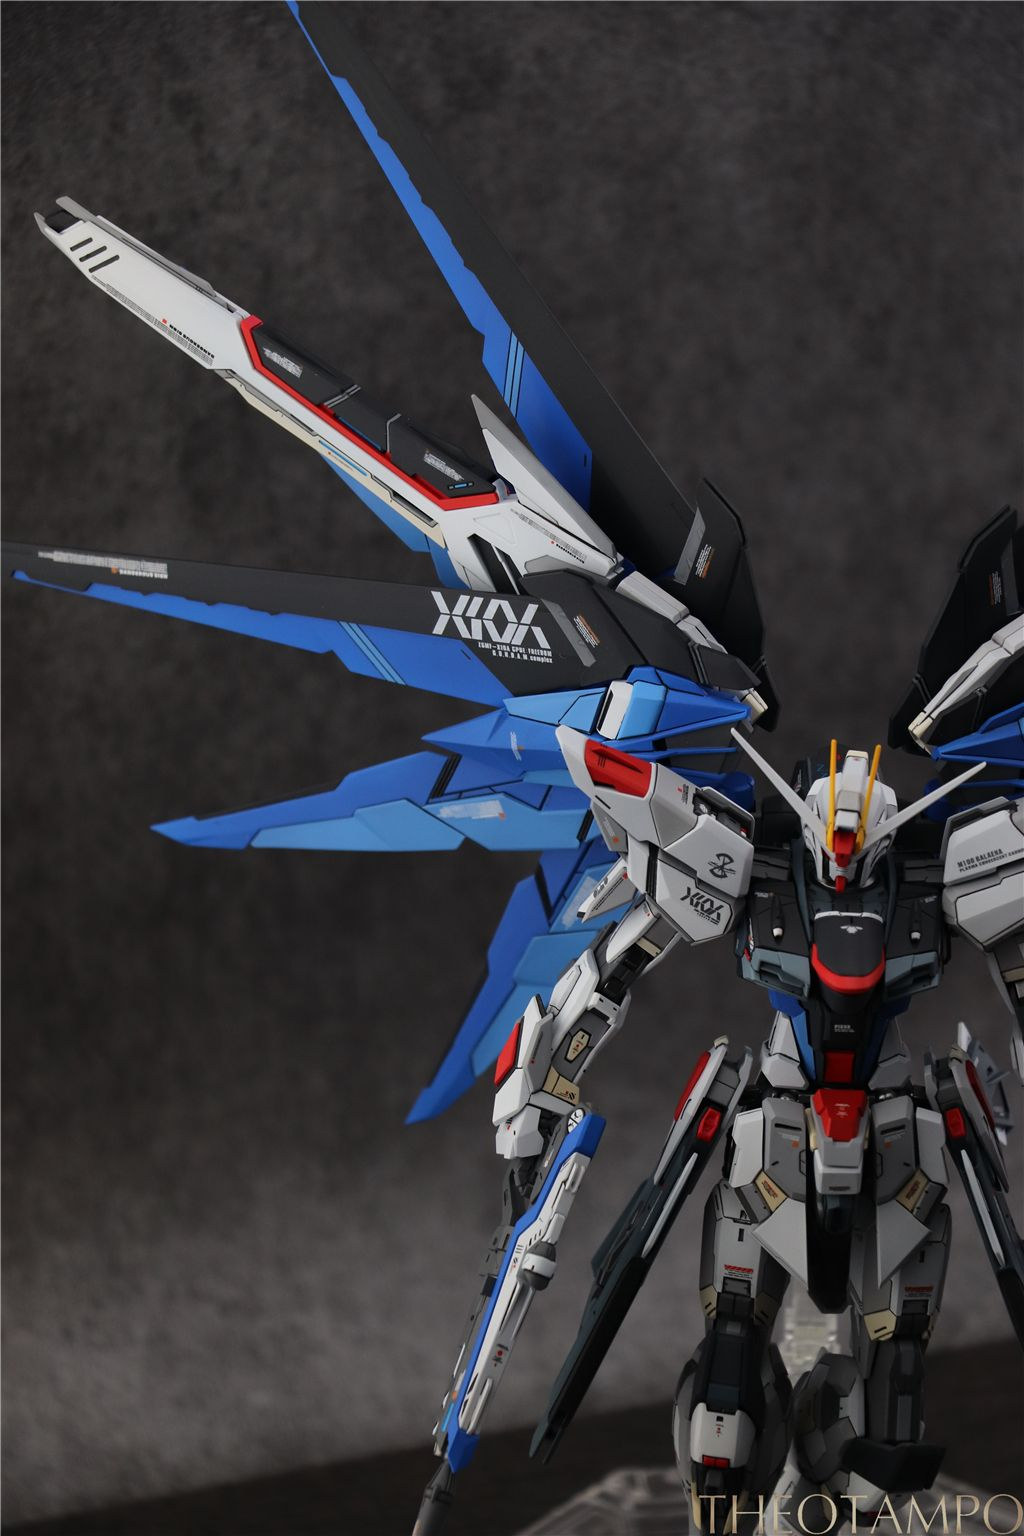 MG FREEDOM GUNDAM 2.0 自由高達 無限維度GK - 高達模型綜合討論區 - 78動漫論壇 模型論壇 www.78dm.net 手機版 | Gundam toys ...